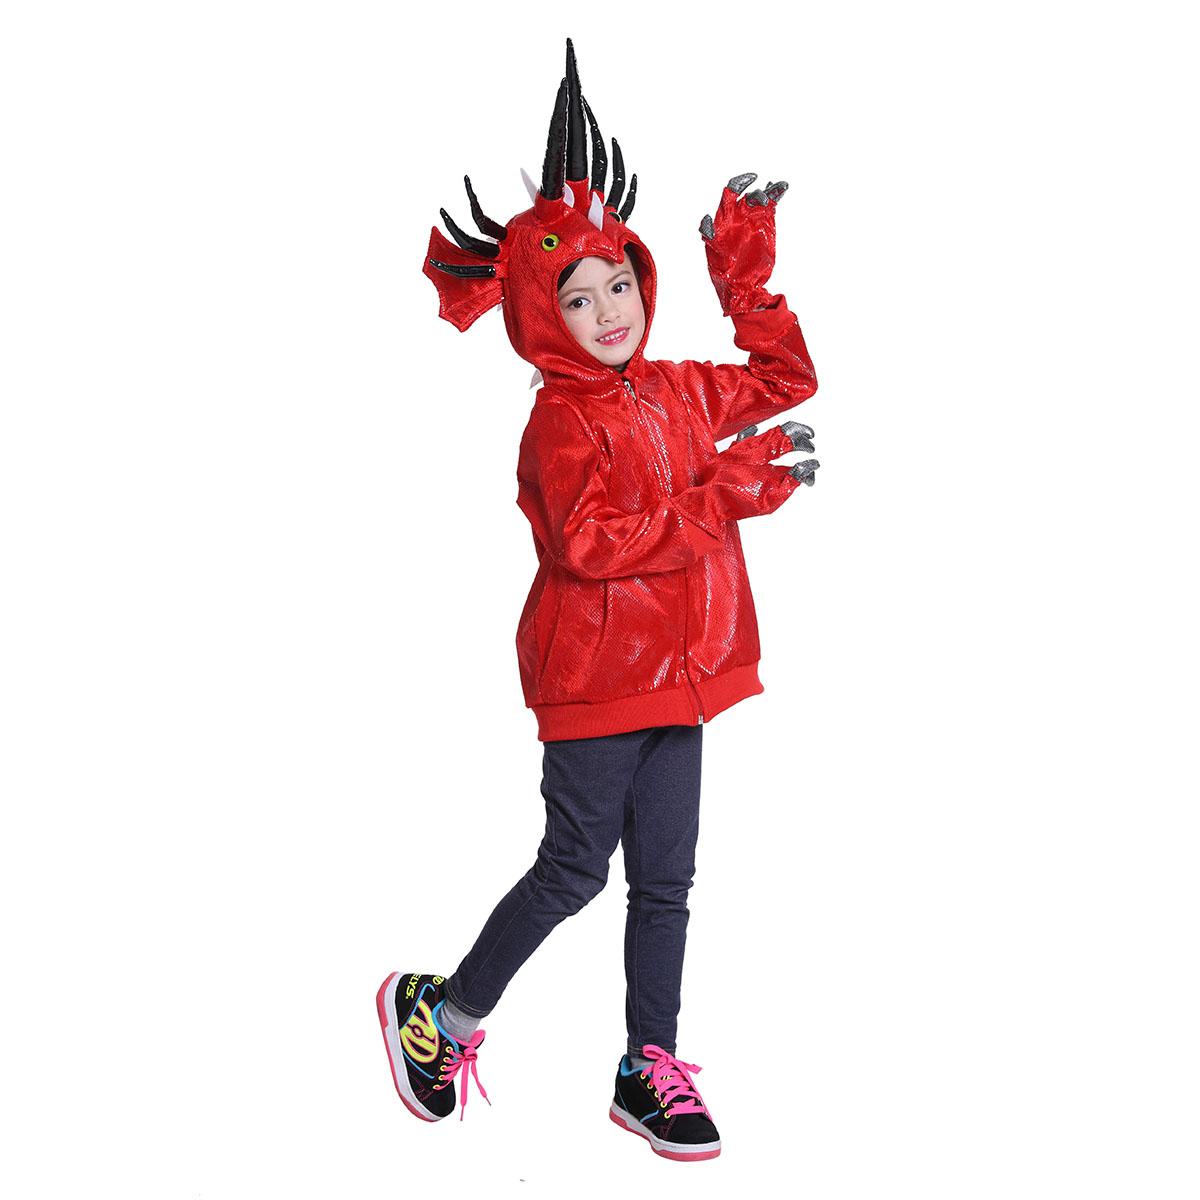 fiery dinosaur costume for girls and boys - dragon halloween costume